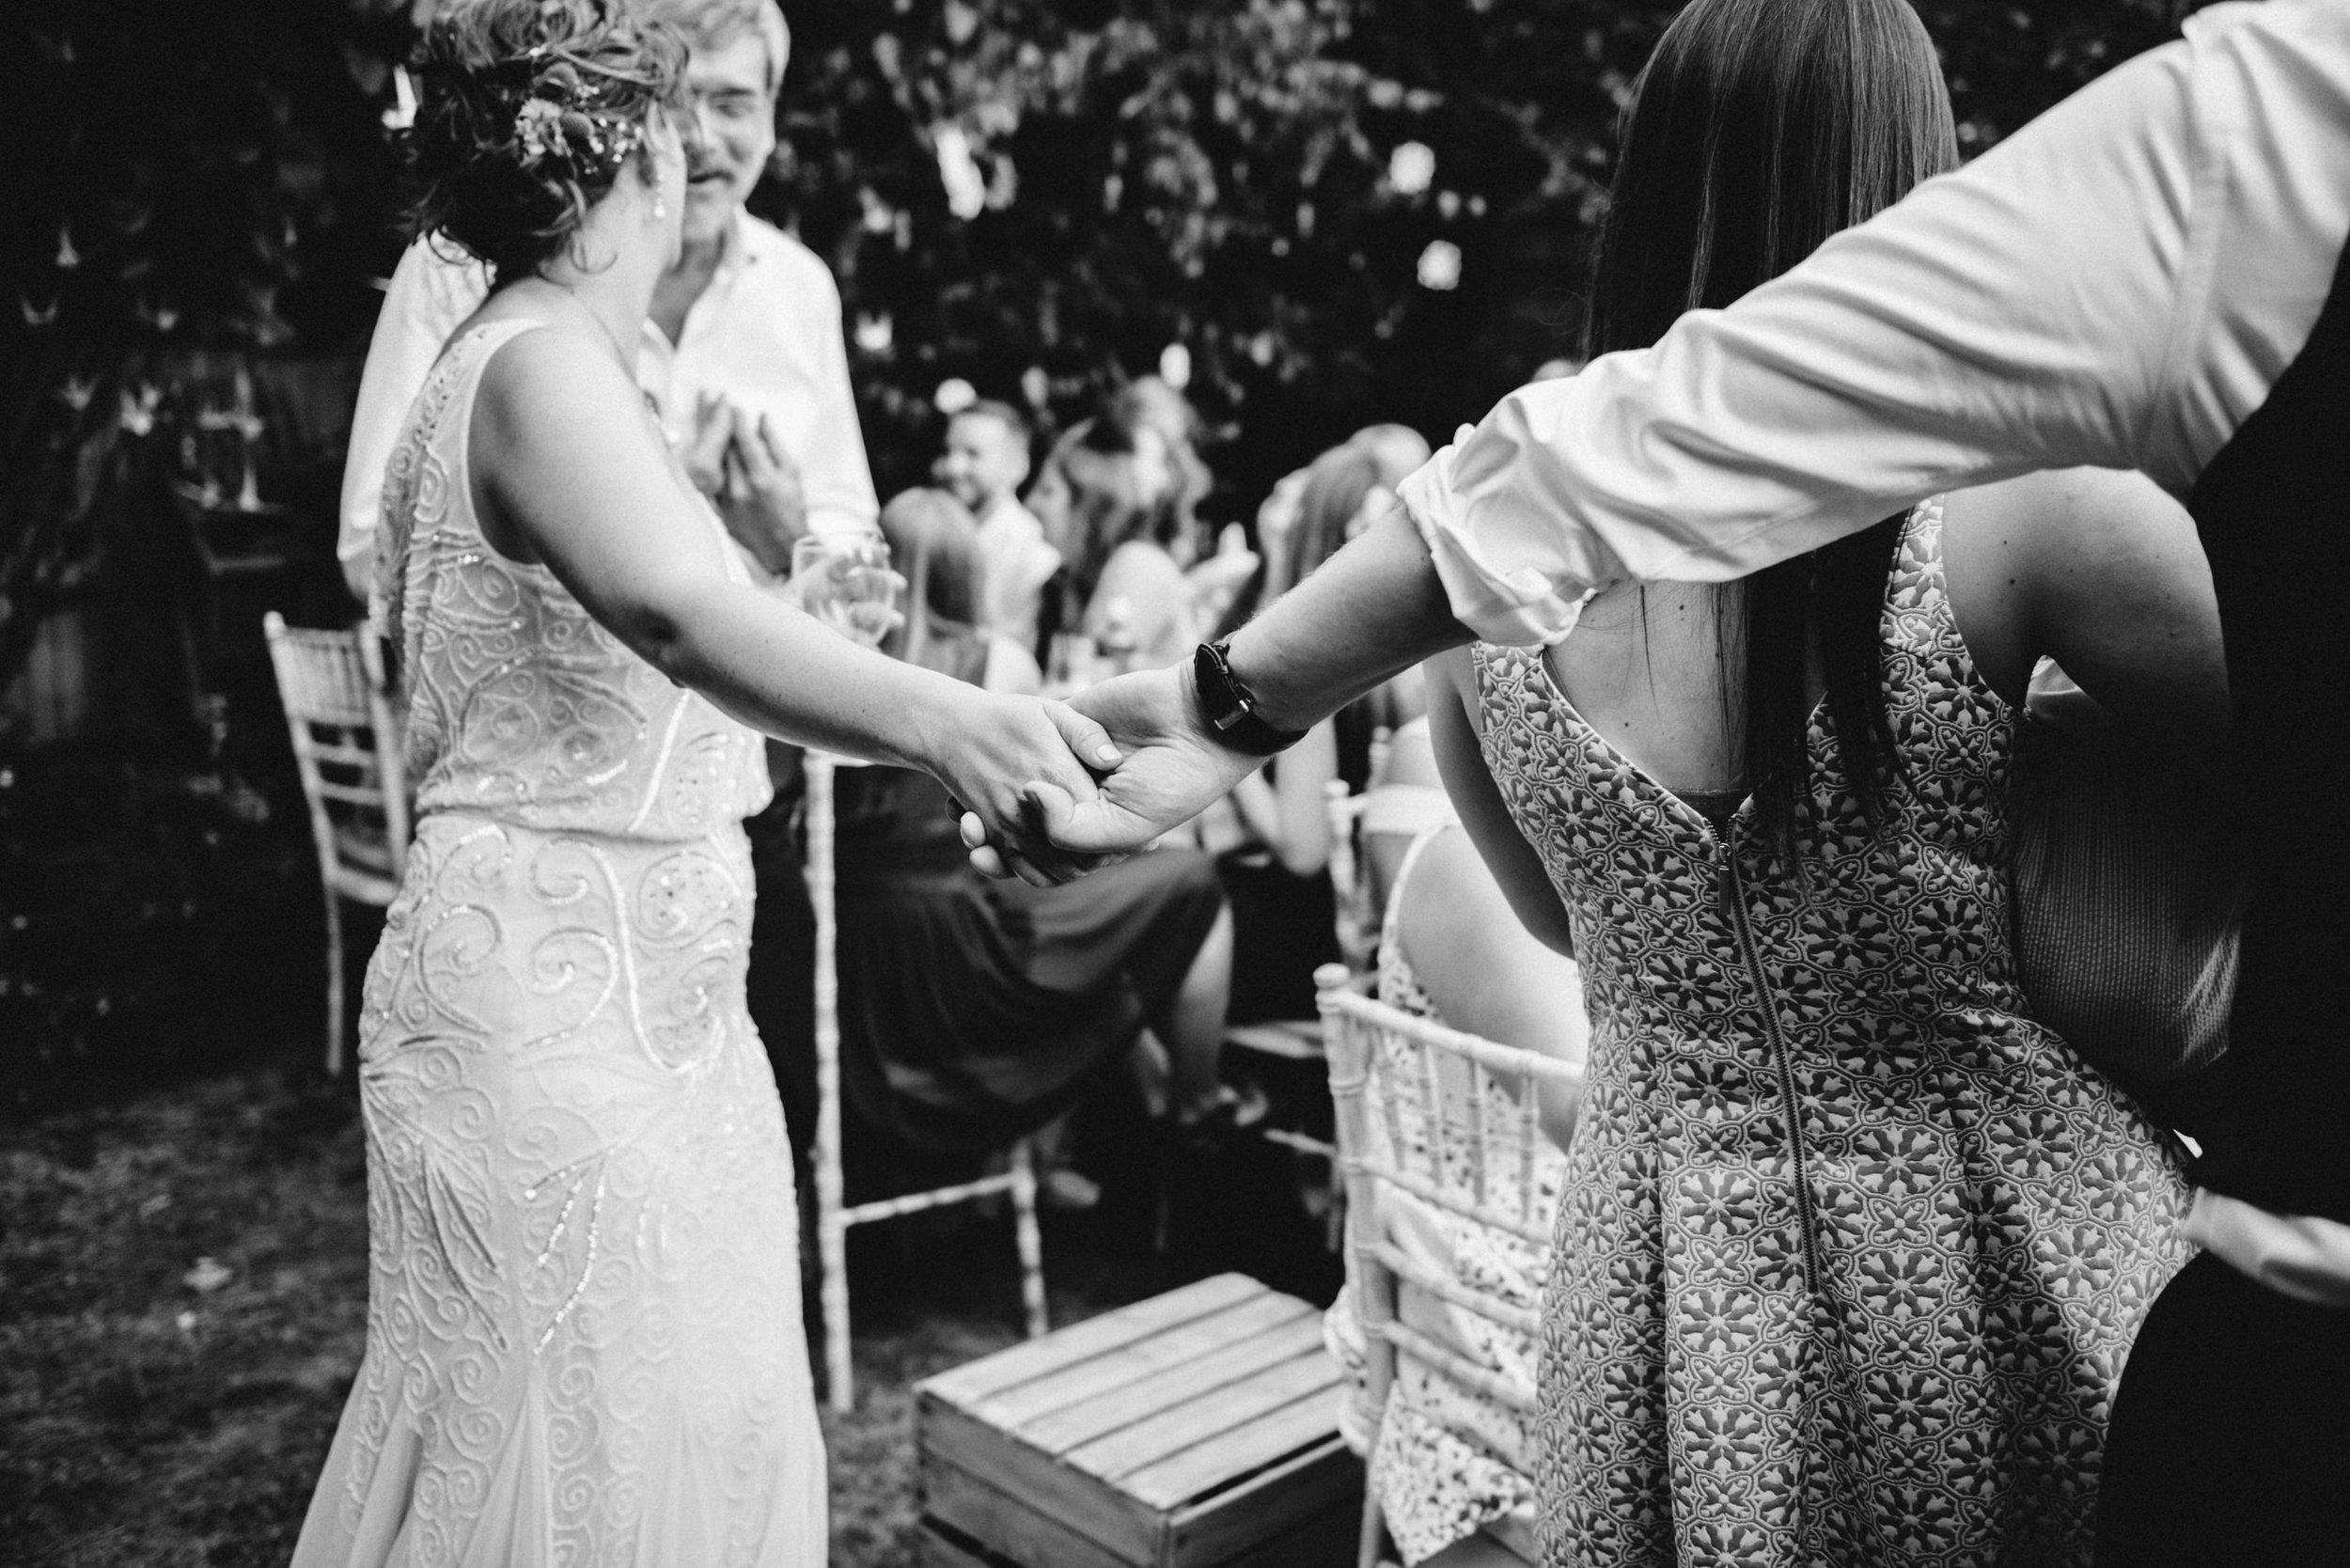 0020-LISA-DEVINE-PHOTOGRAPHY-ALTERNATIVE-WEDDING-PHOTOGRAPHY-SCOTLAND-DESTINATION-WEDDINGS-GLASGOW-WEDDINGS-COOL-WEDDINGS-STYLISH-WEDDINGS.JPG